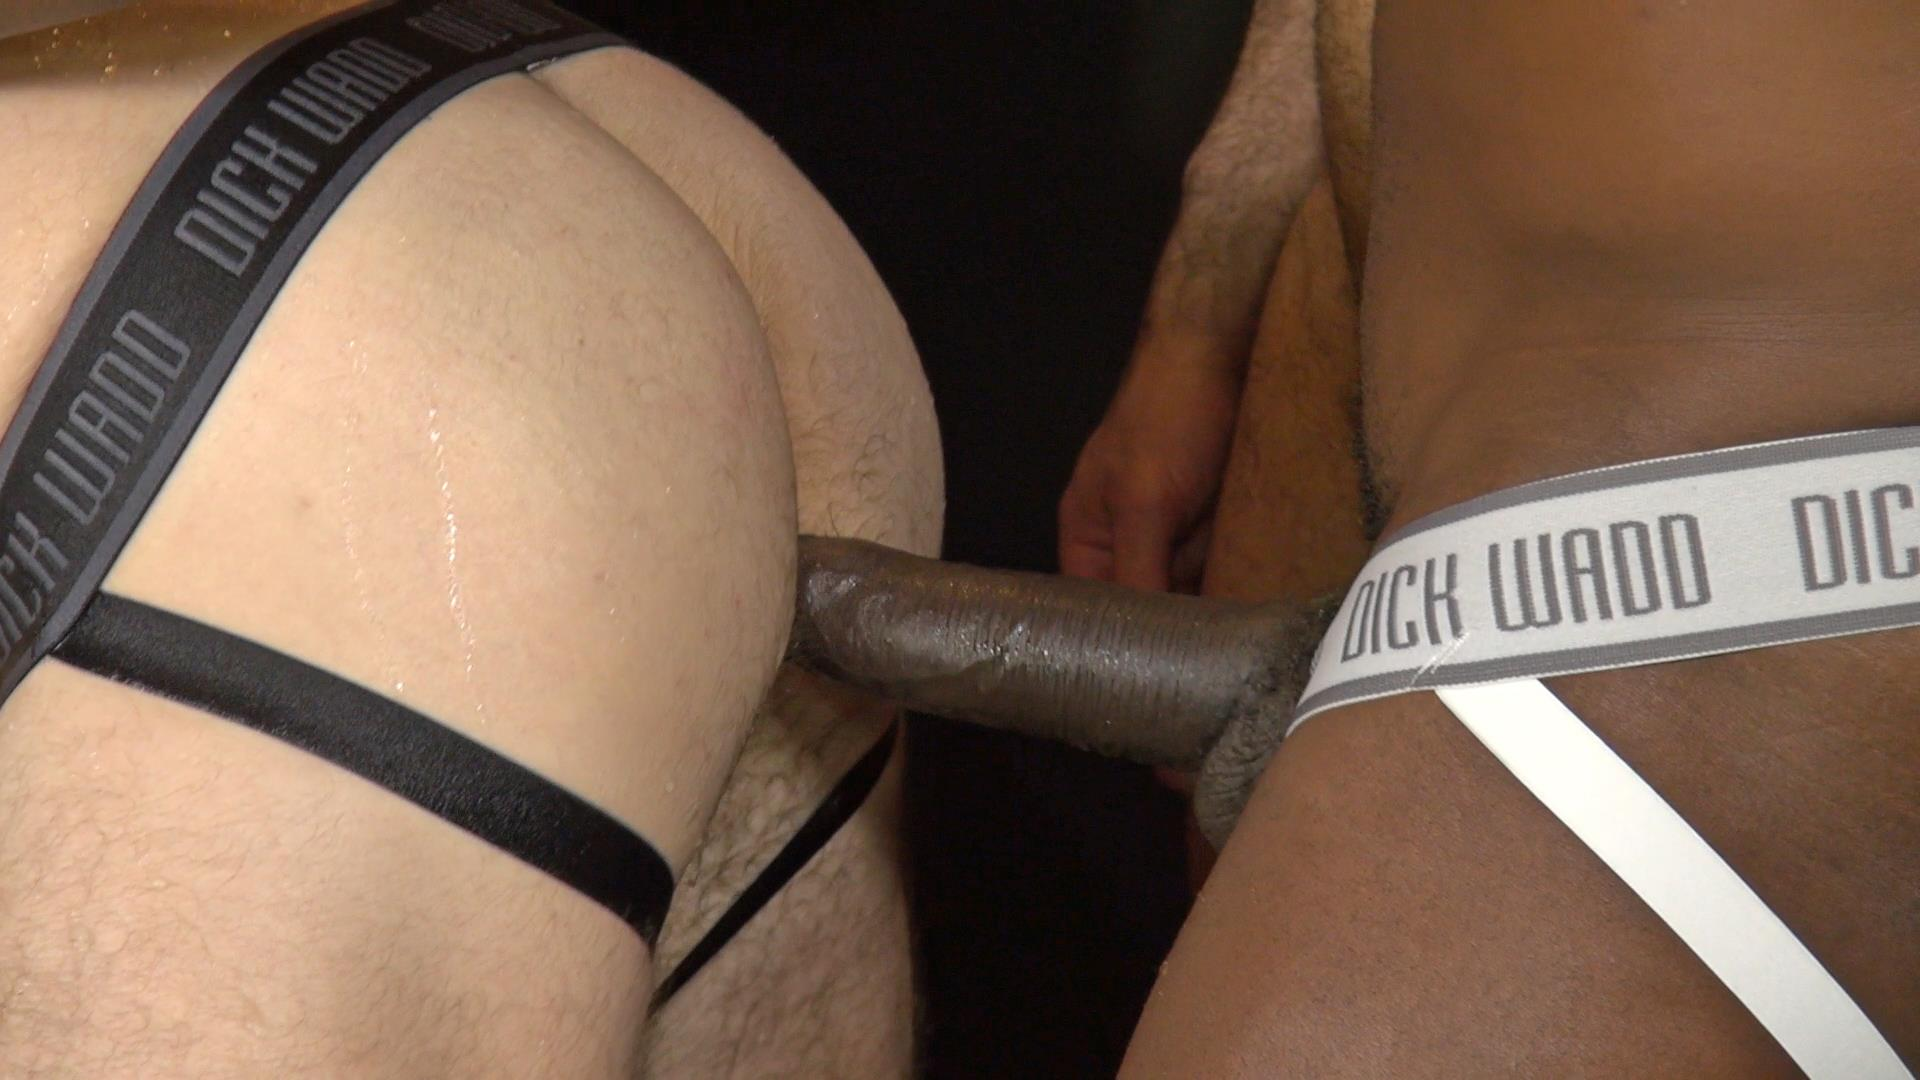 Raw-and-Rough-Ken-Byker-Dayton-OConnor-Trelino-Shay-Michaels-Adam-Russo-Cutler-X-Interracial-Bareback-Orgy-Amateur-Gay-Porn-04 Interracial Bareback Orgy With Adam Russo & Cutler X